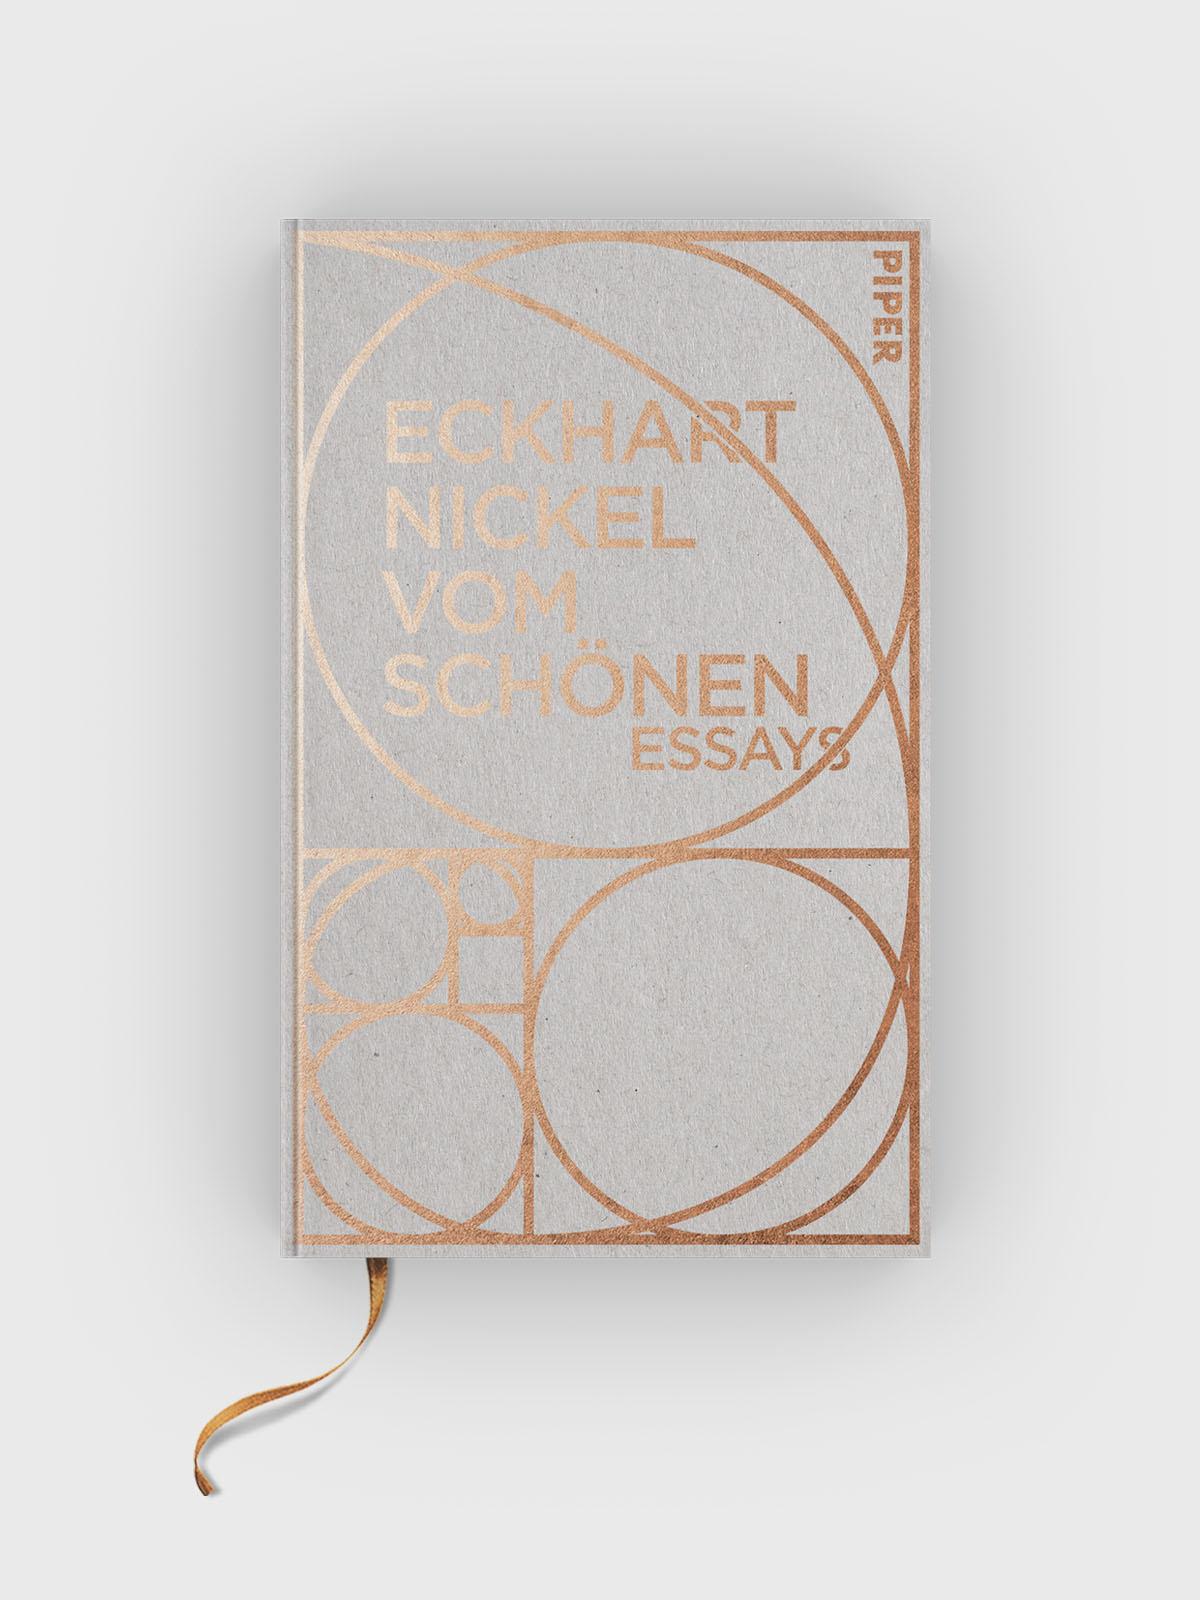 Eckhart Nickel